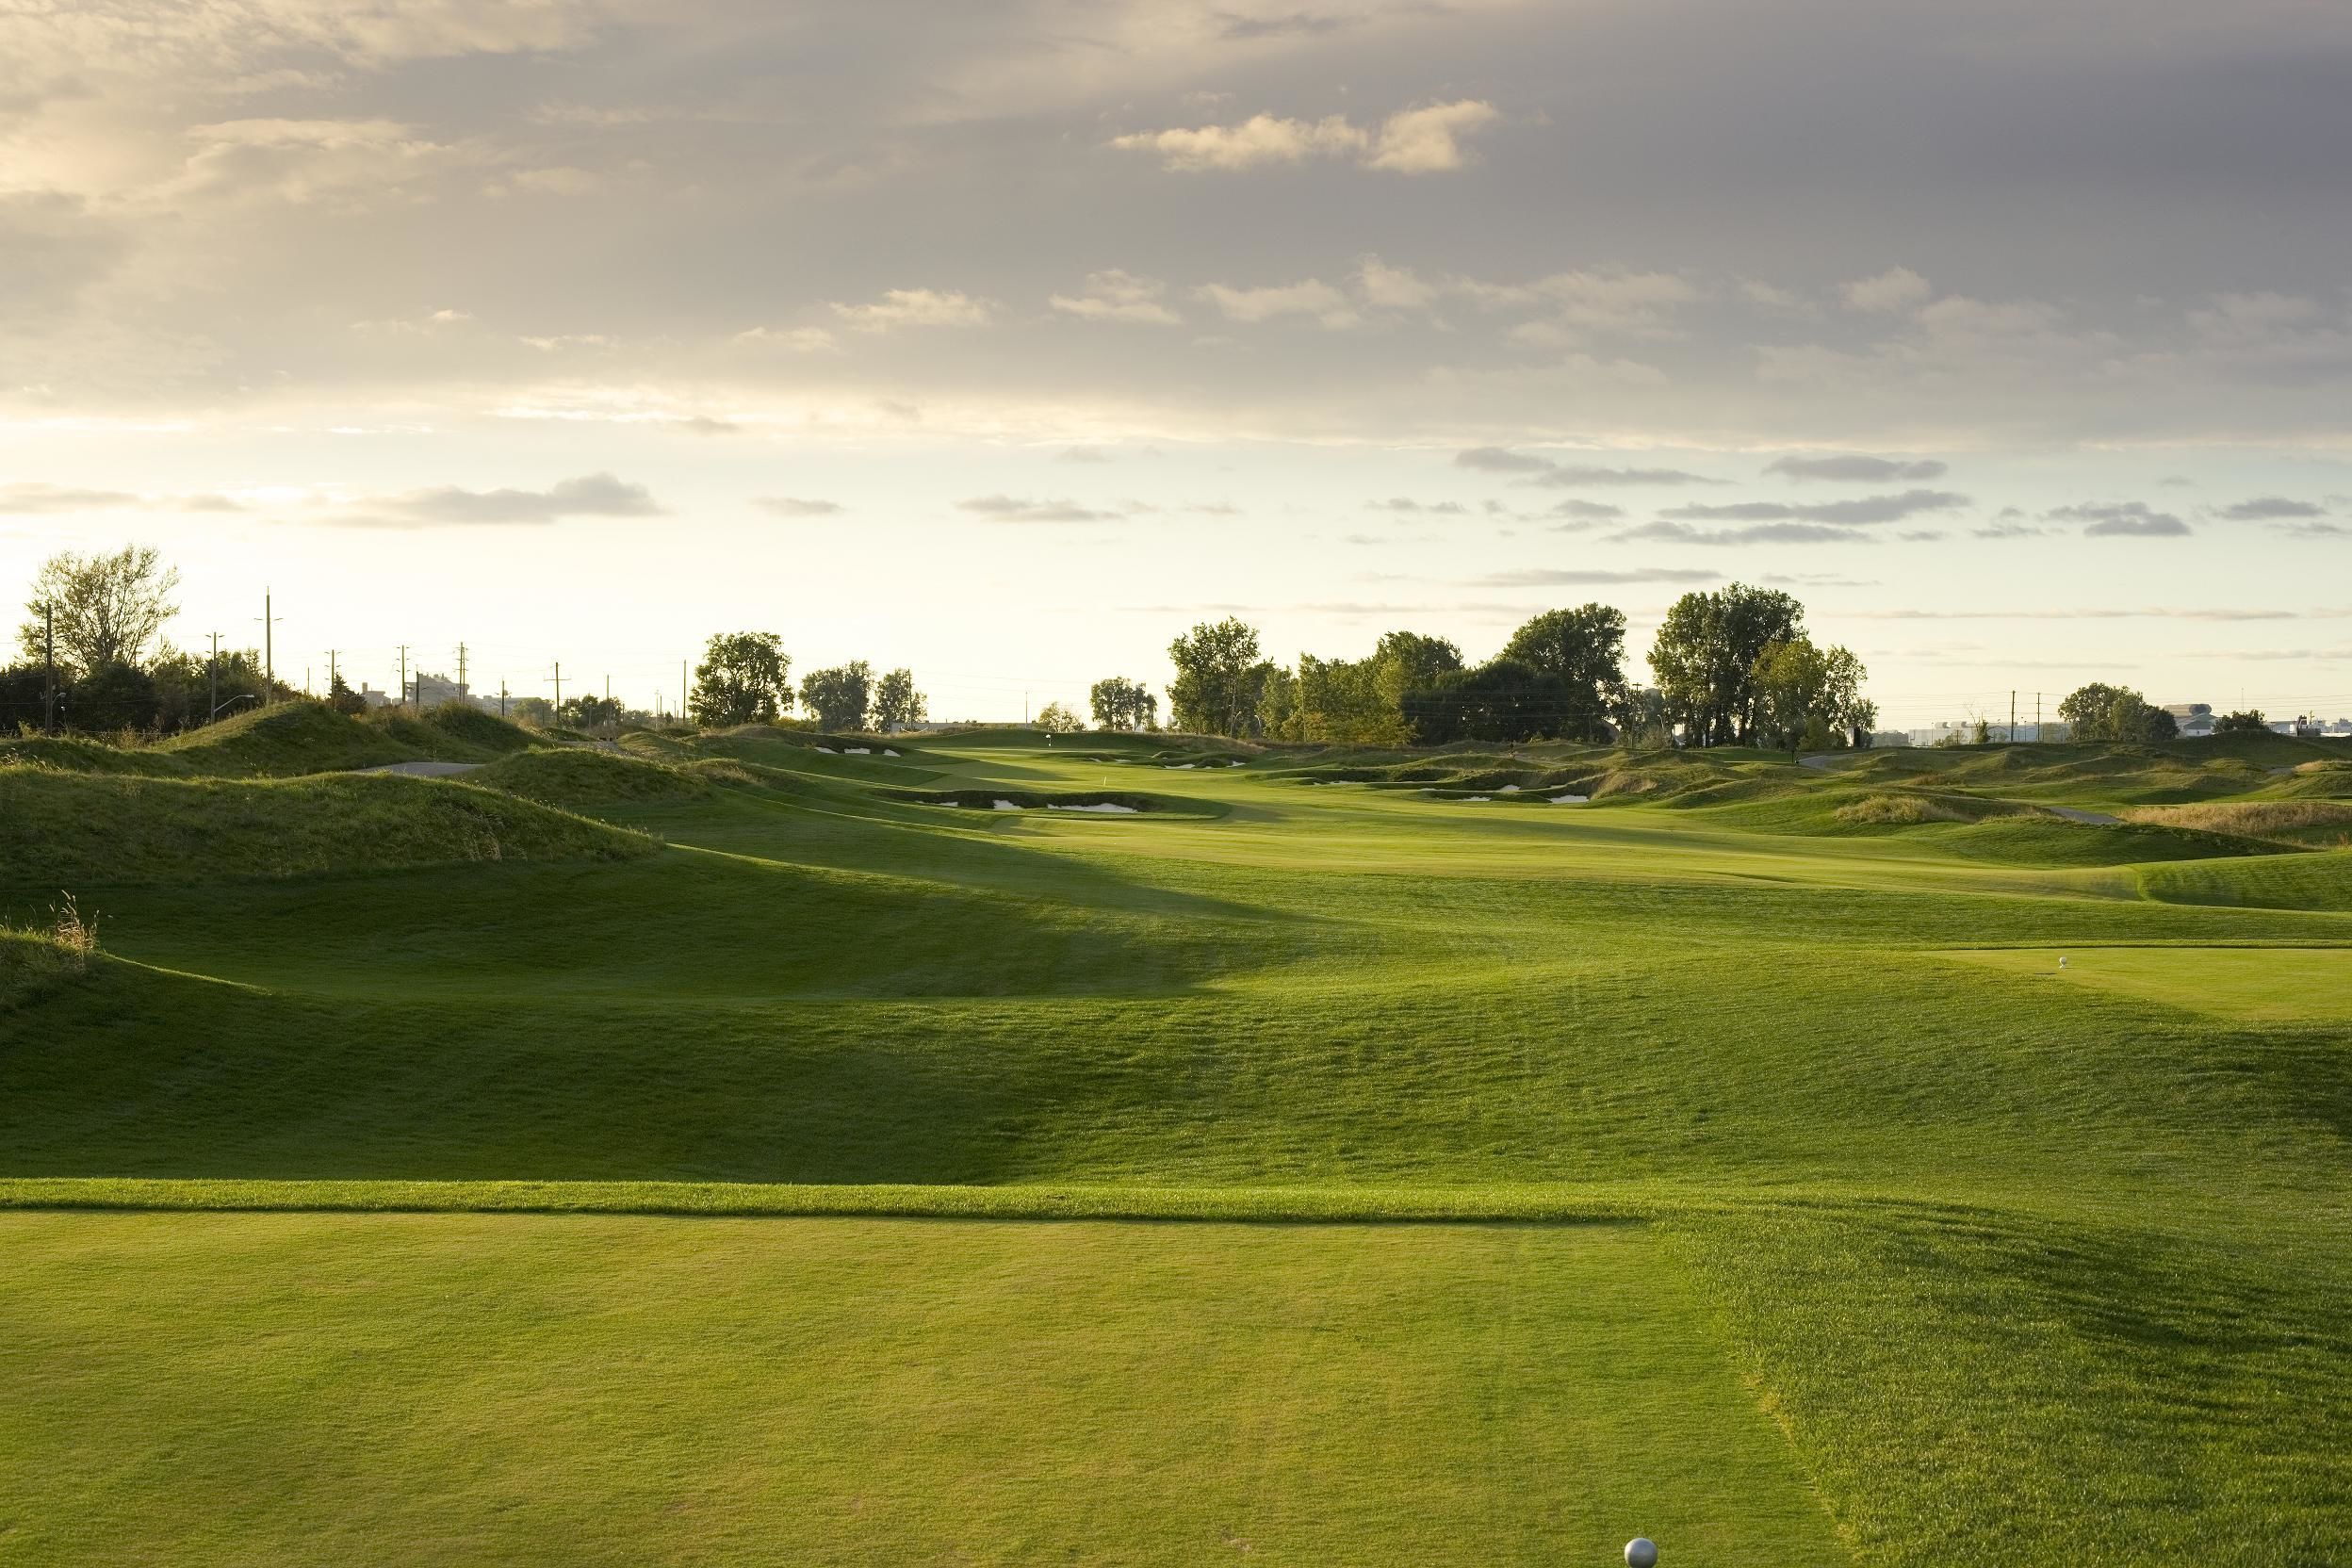 Ambassador golf club cover picture